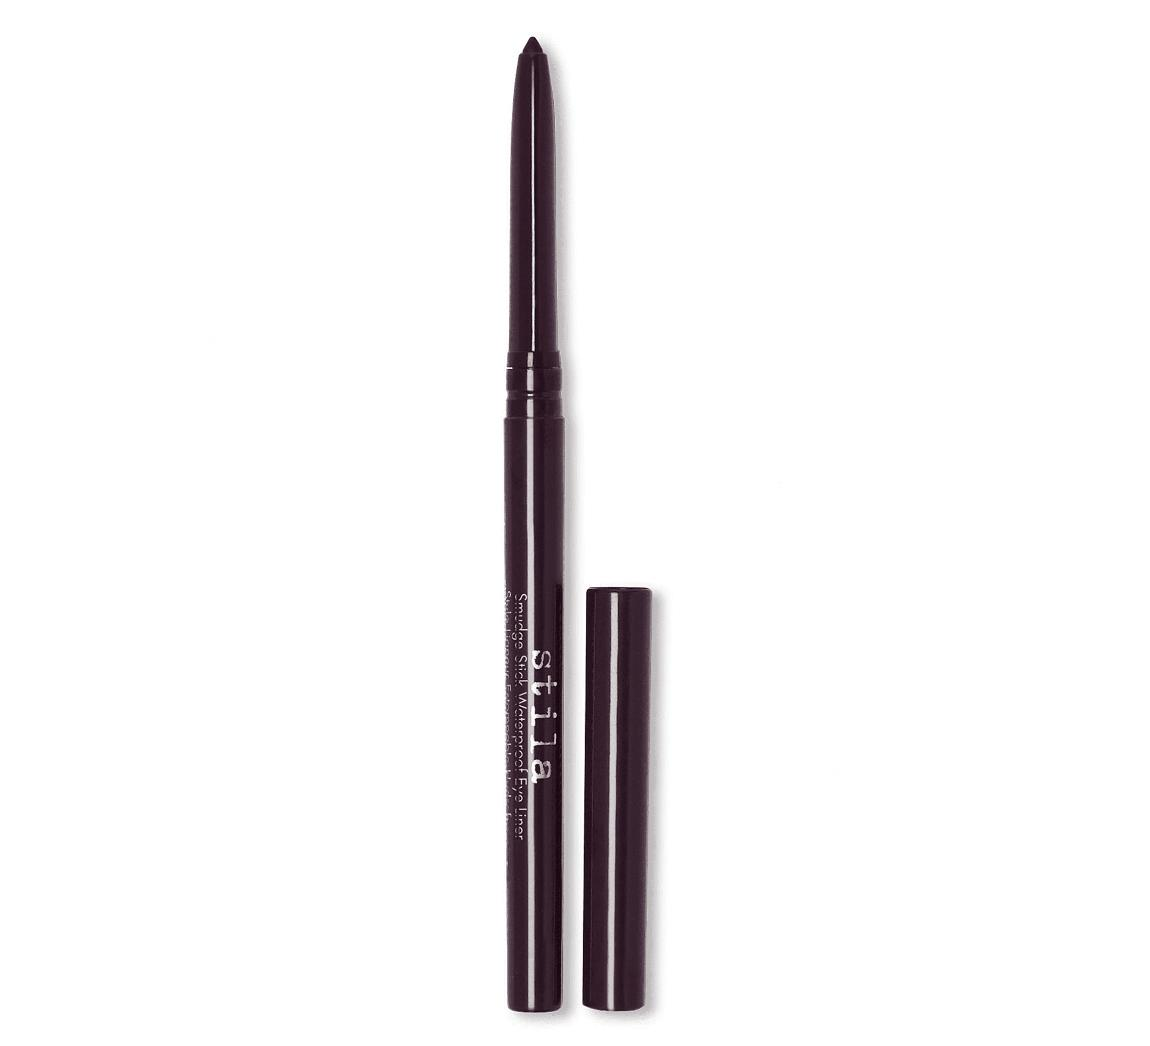 Stila Smudge Stick Waterproof Eyeliner Vivid Amethyst